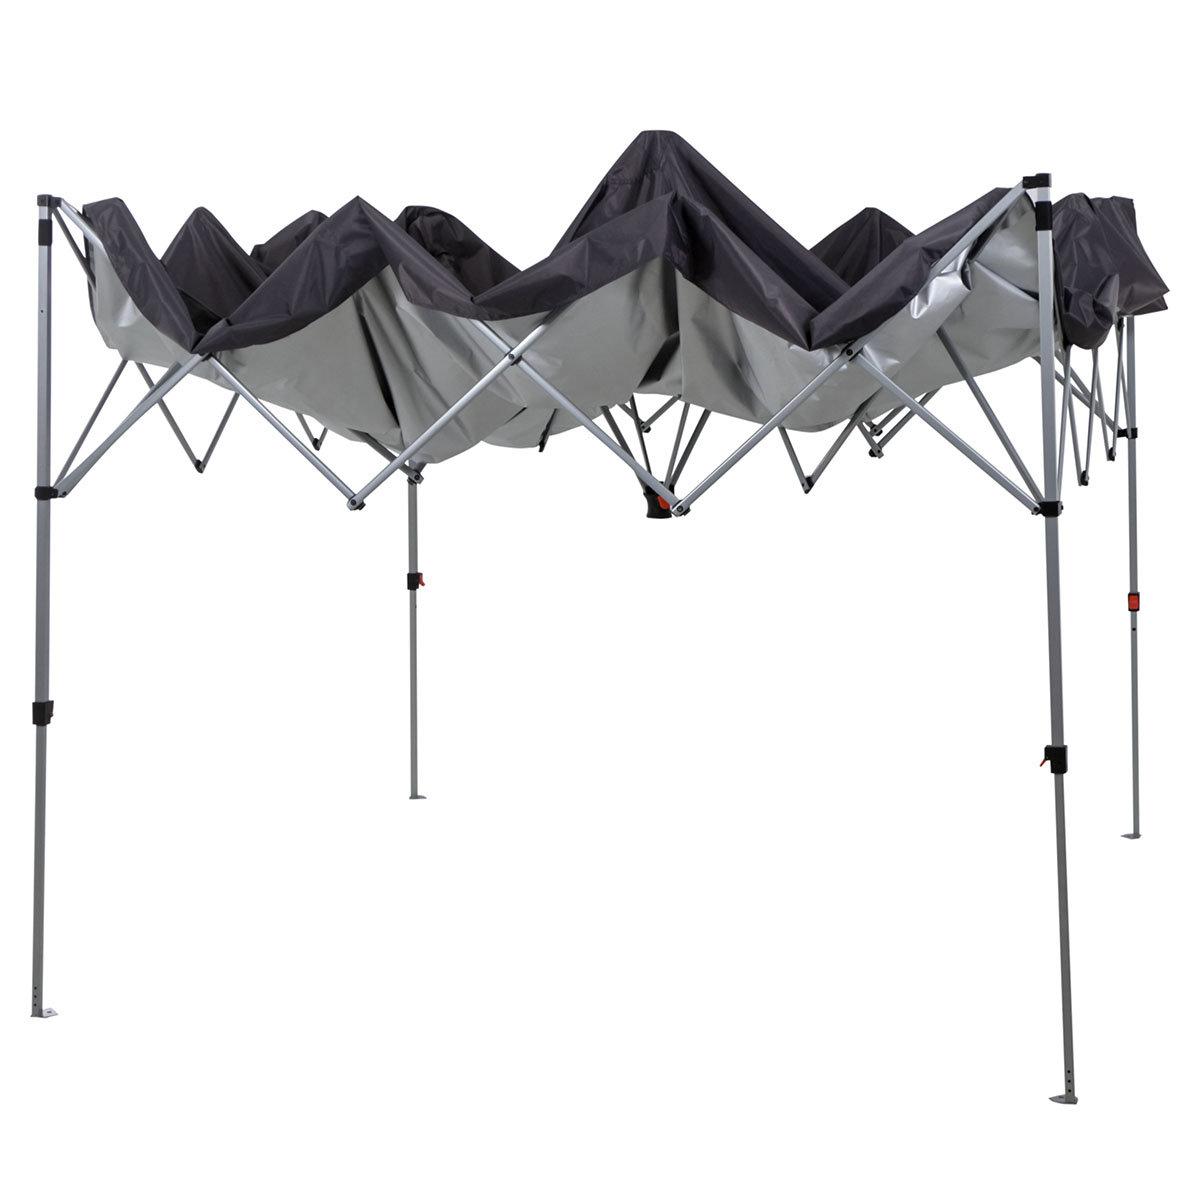 Faltpavillon EasyUp, 300x300 cm, anthrazit | #3